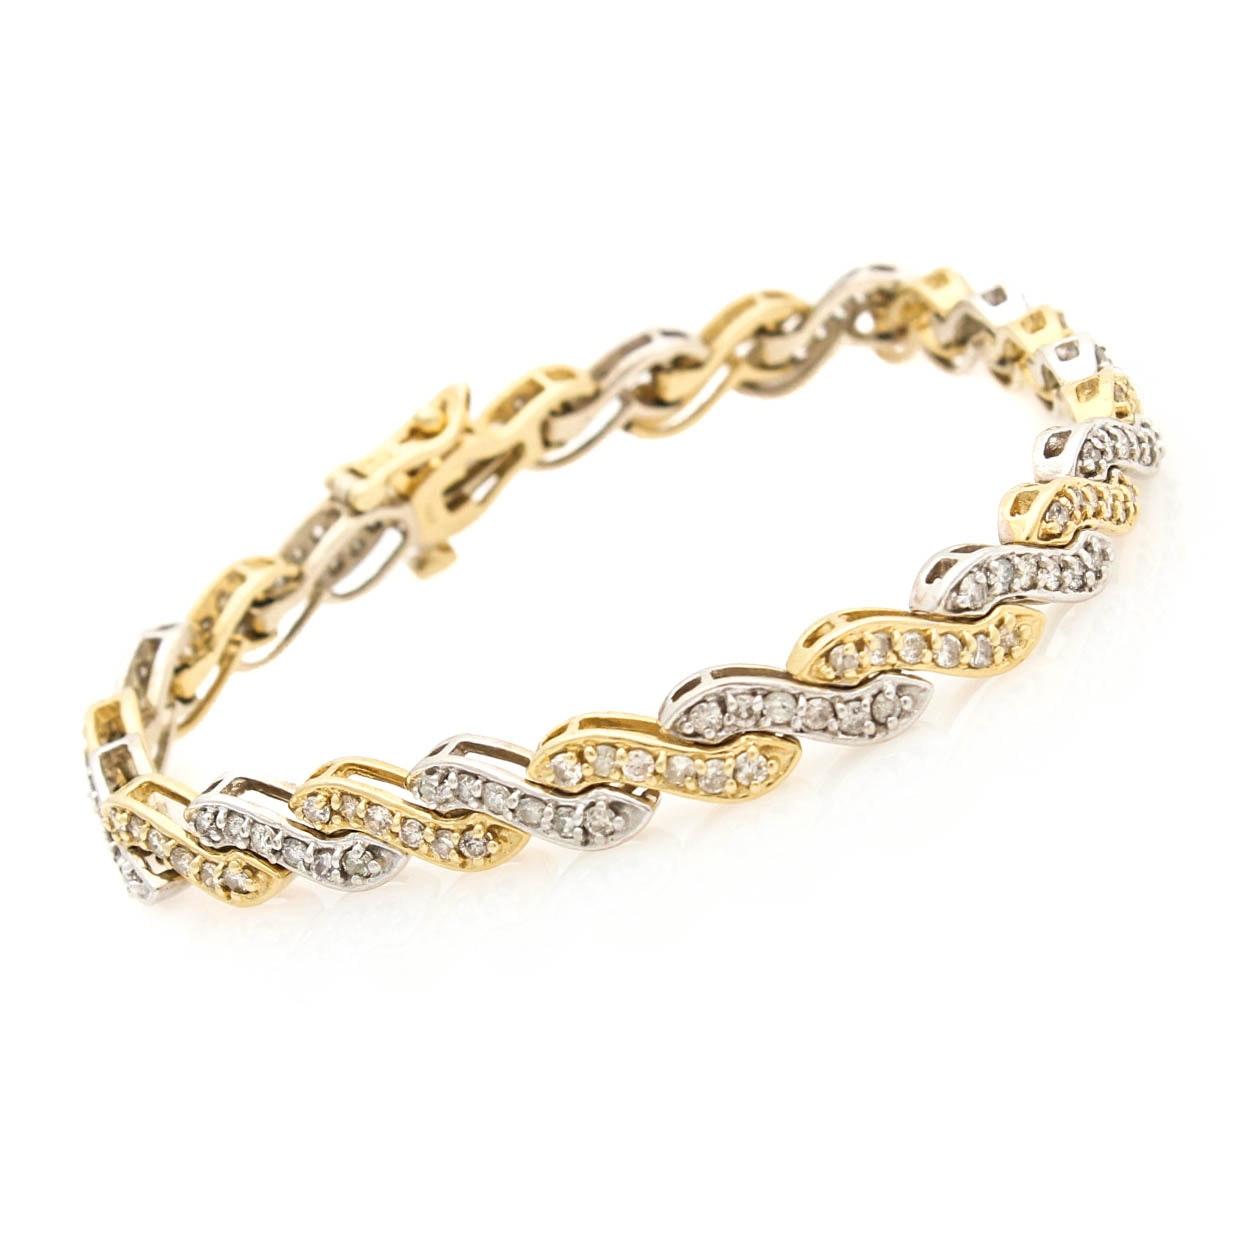 14K White and Yellow Gold 3.00 CTW Diamond Bracelet